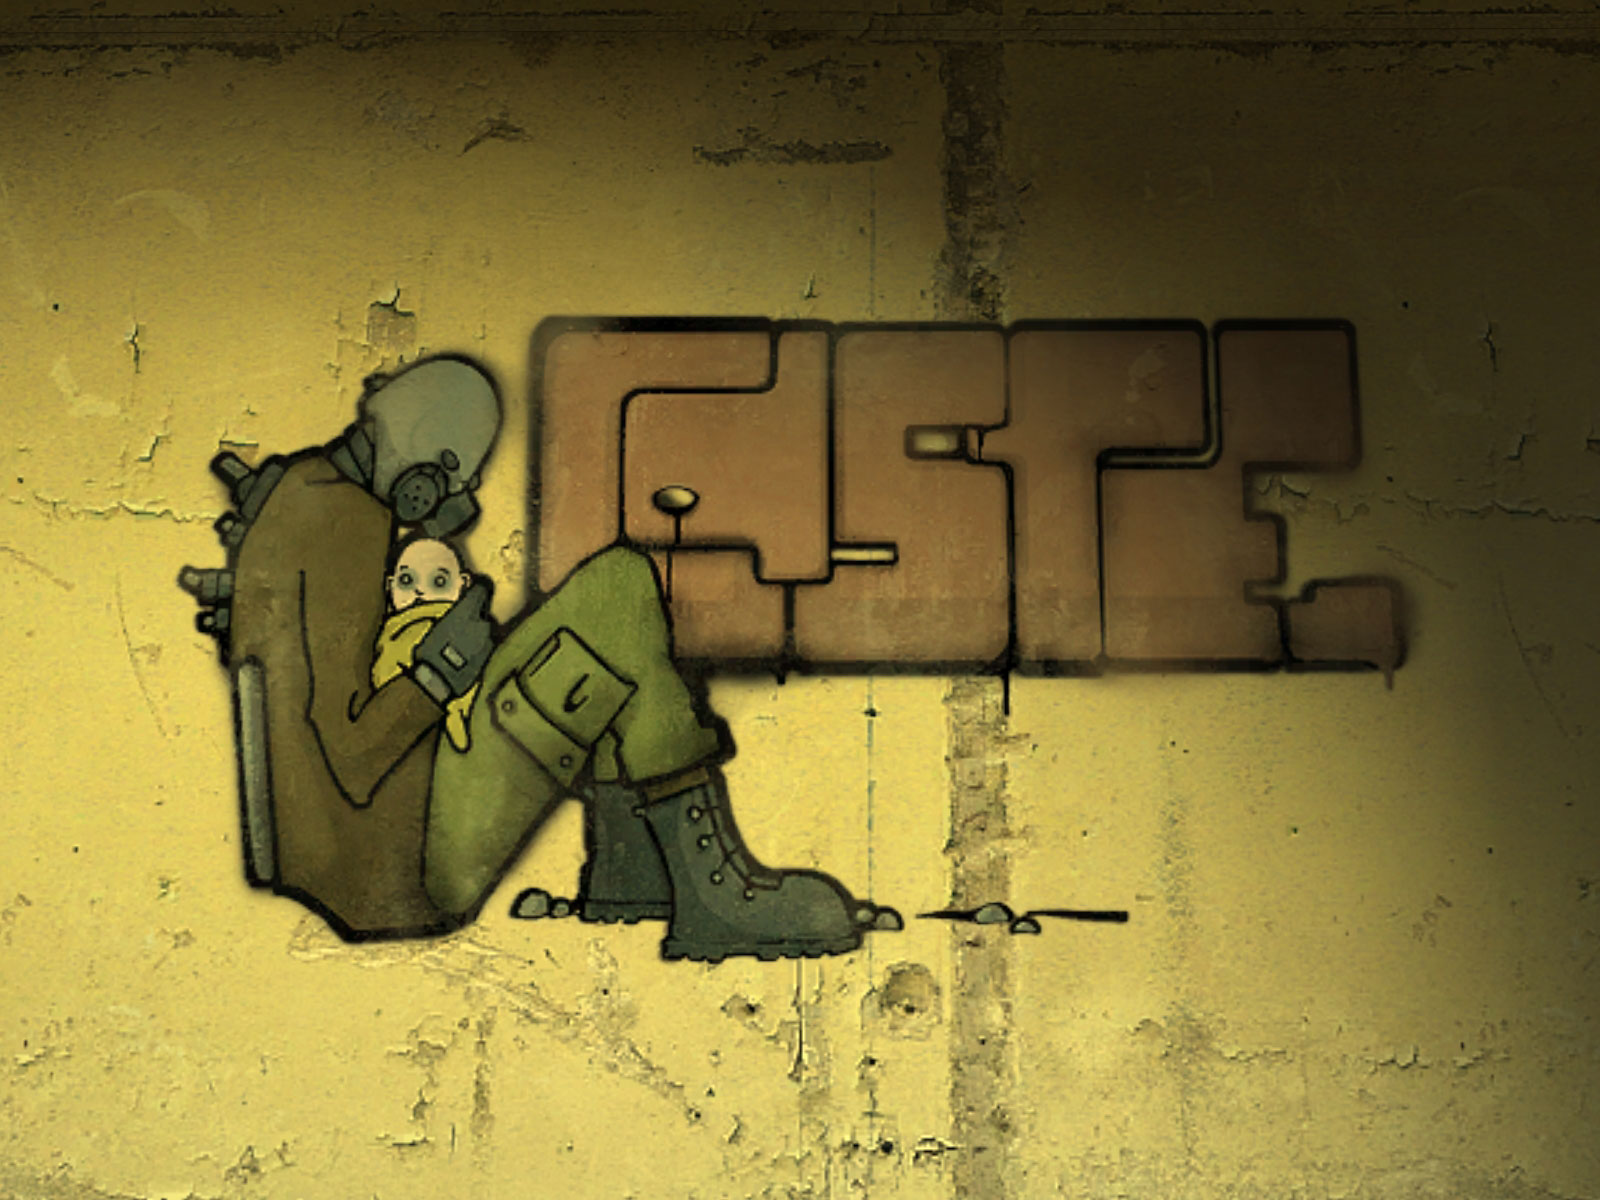 Half Life Iphone Wallpaper: Half-life Wallpaper And Background